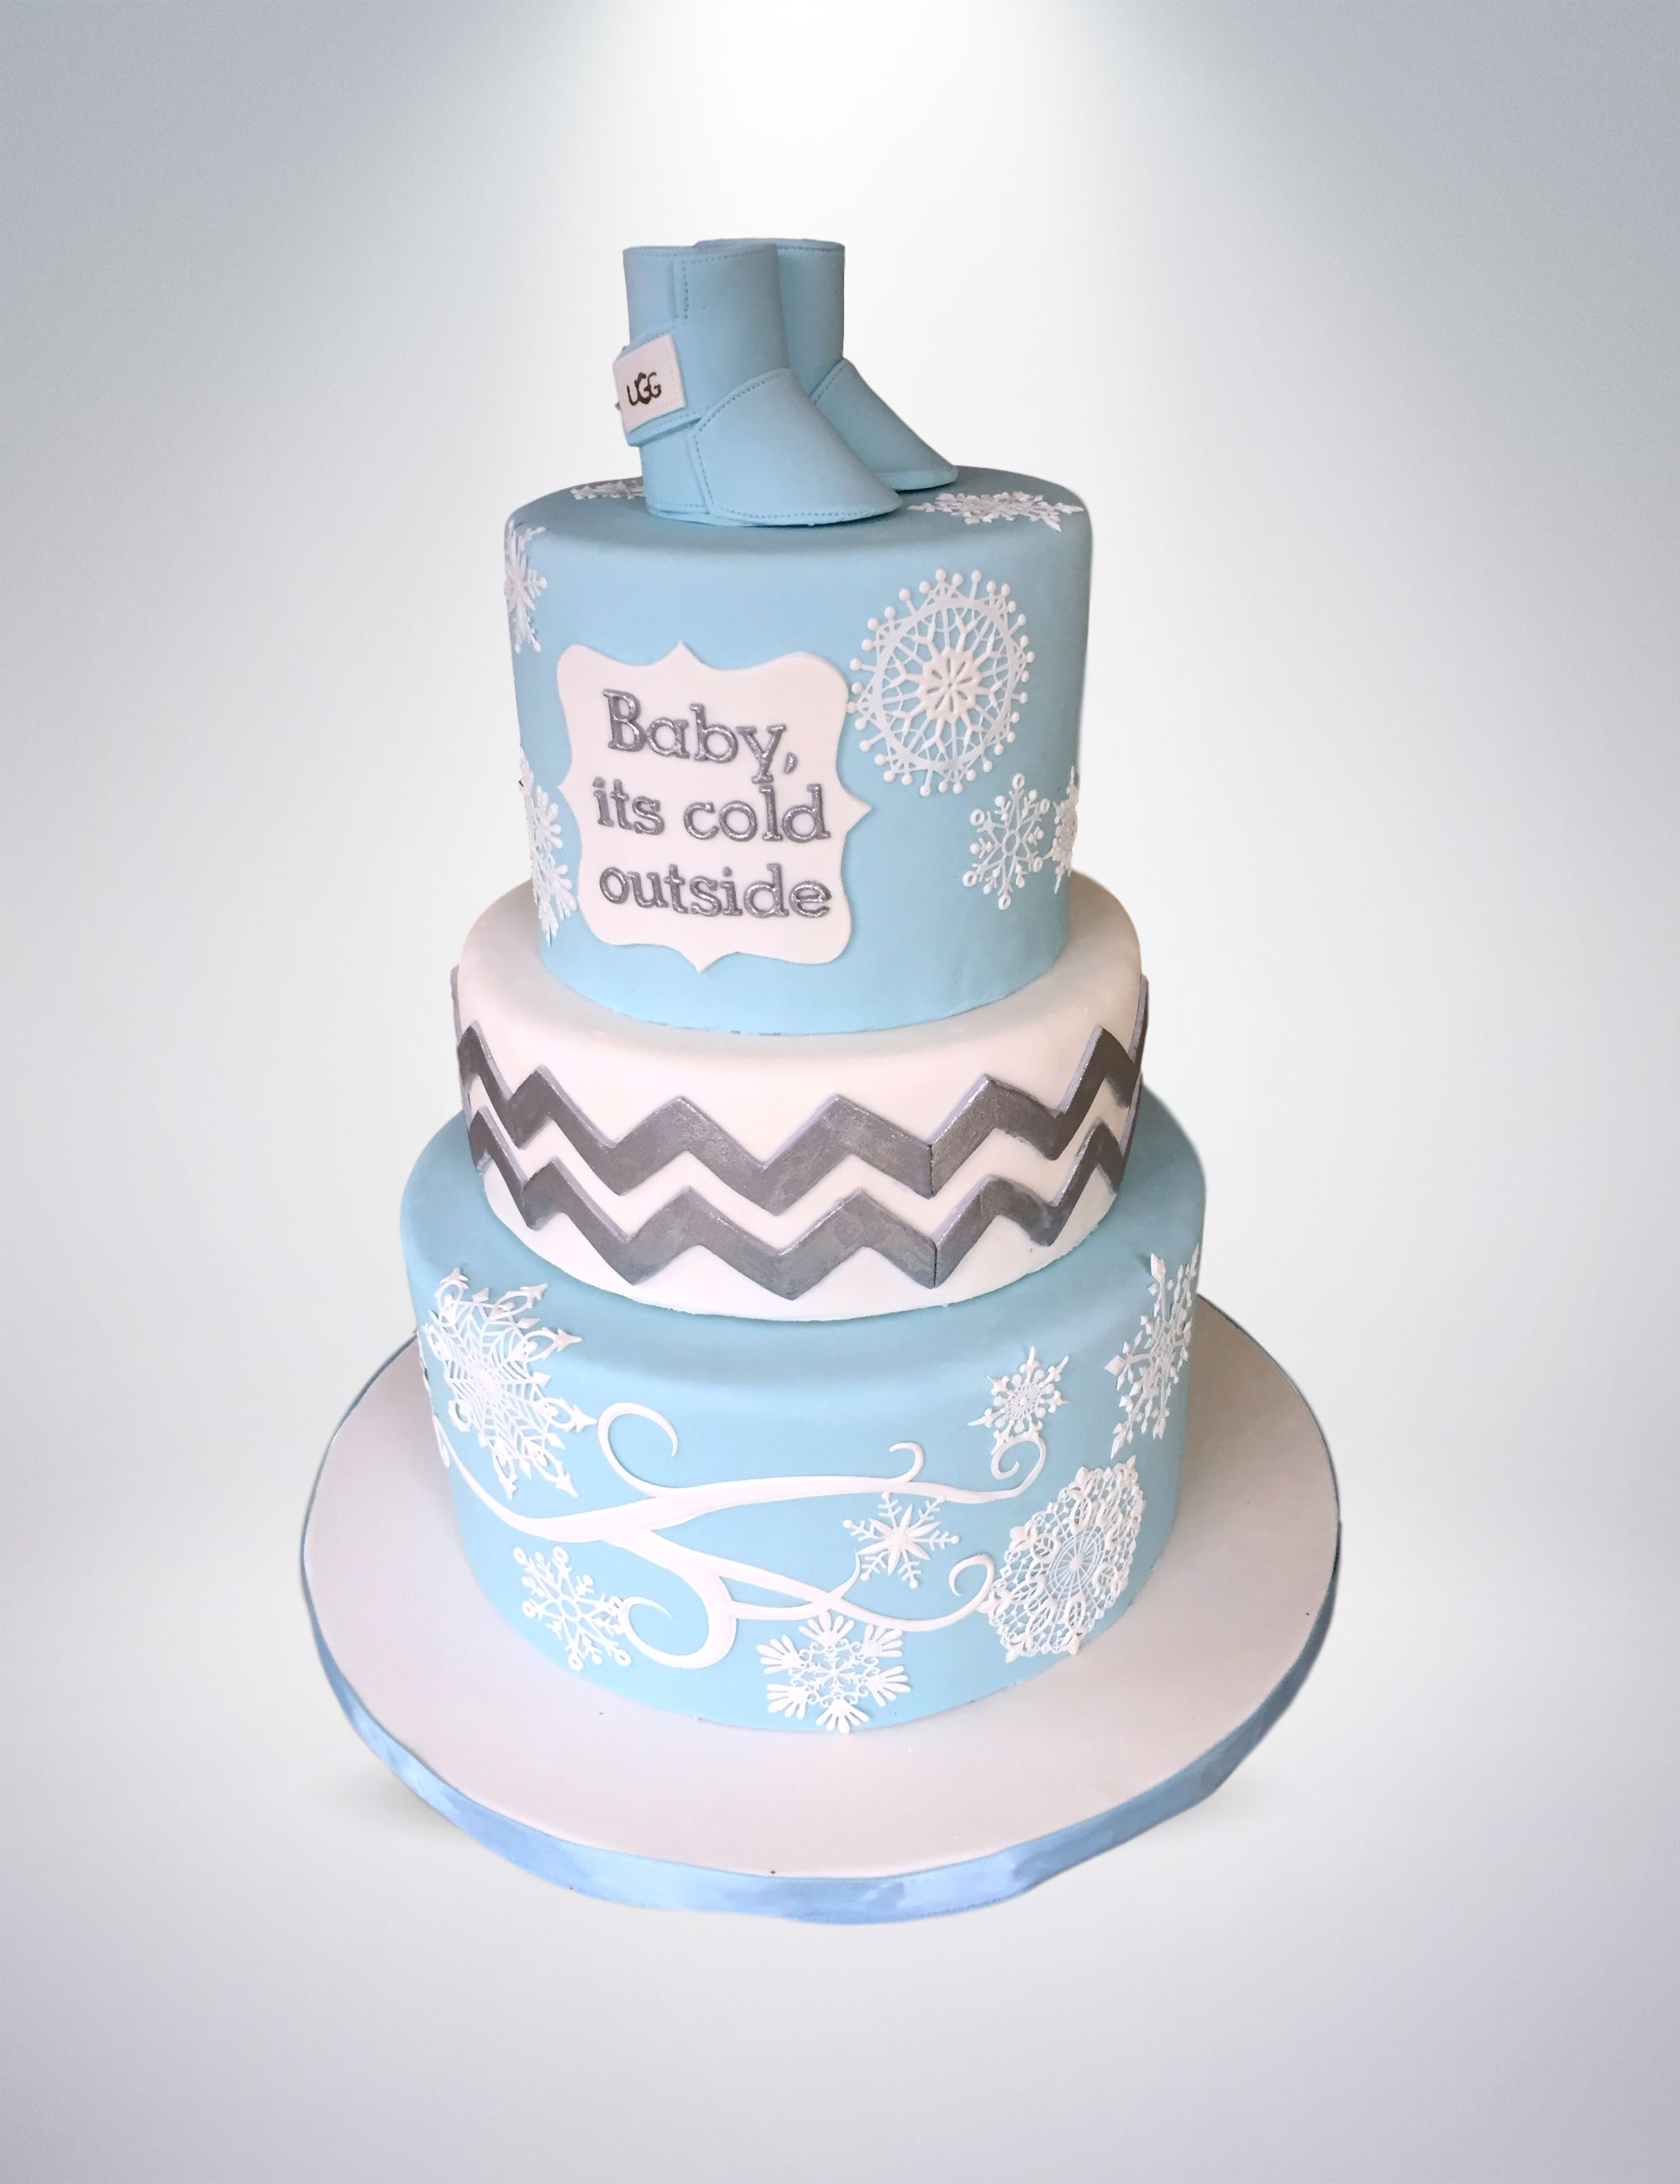 Winter Wonderland Baby Shower Cake. Winter Wonderland Cake At Ski Dubai By  Patosherie Cakesdecor